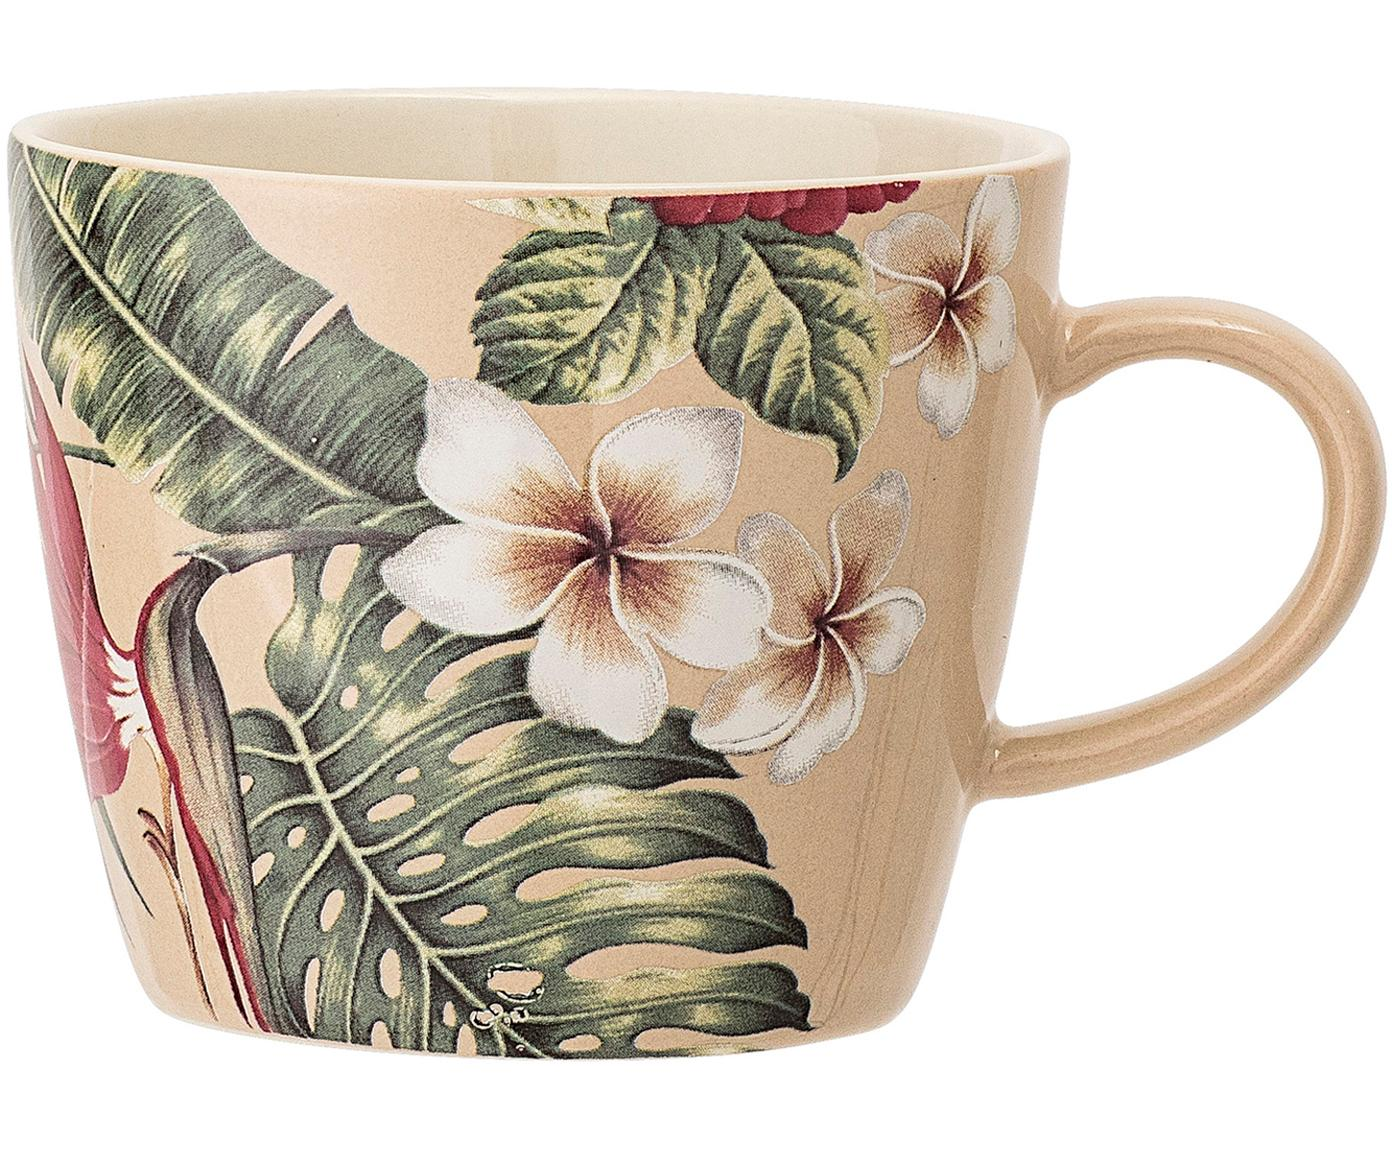 Kaffeetassen Aruba, 2 Stück, Steingut, Cremeweiß, Grün, Rot, Ø 10 x H 8 cm